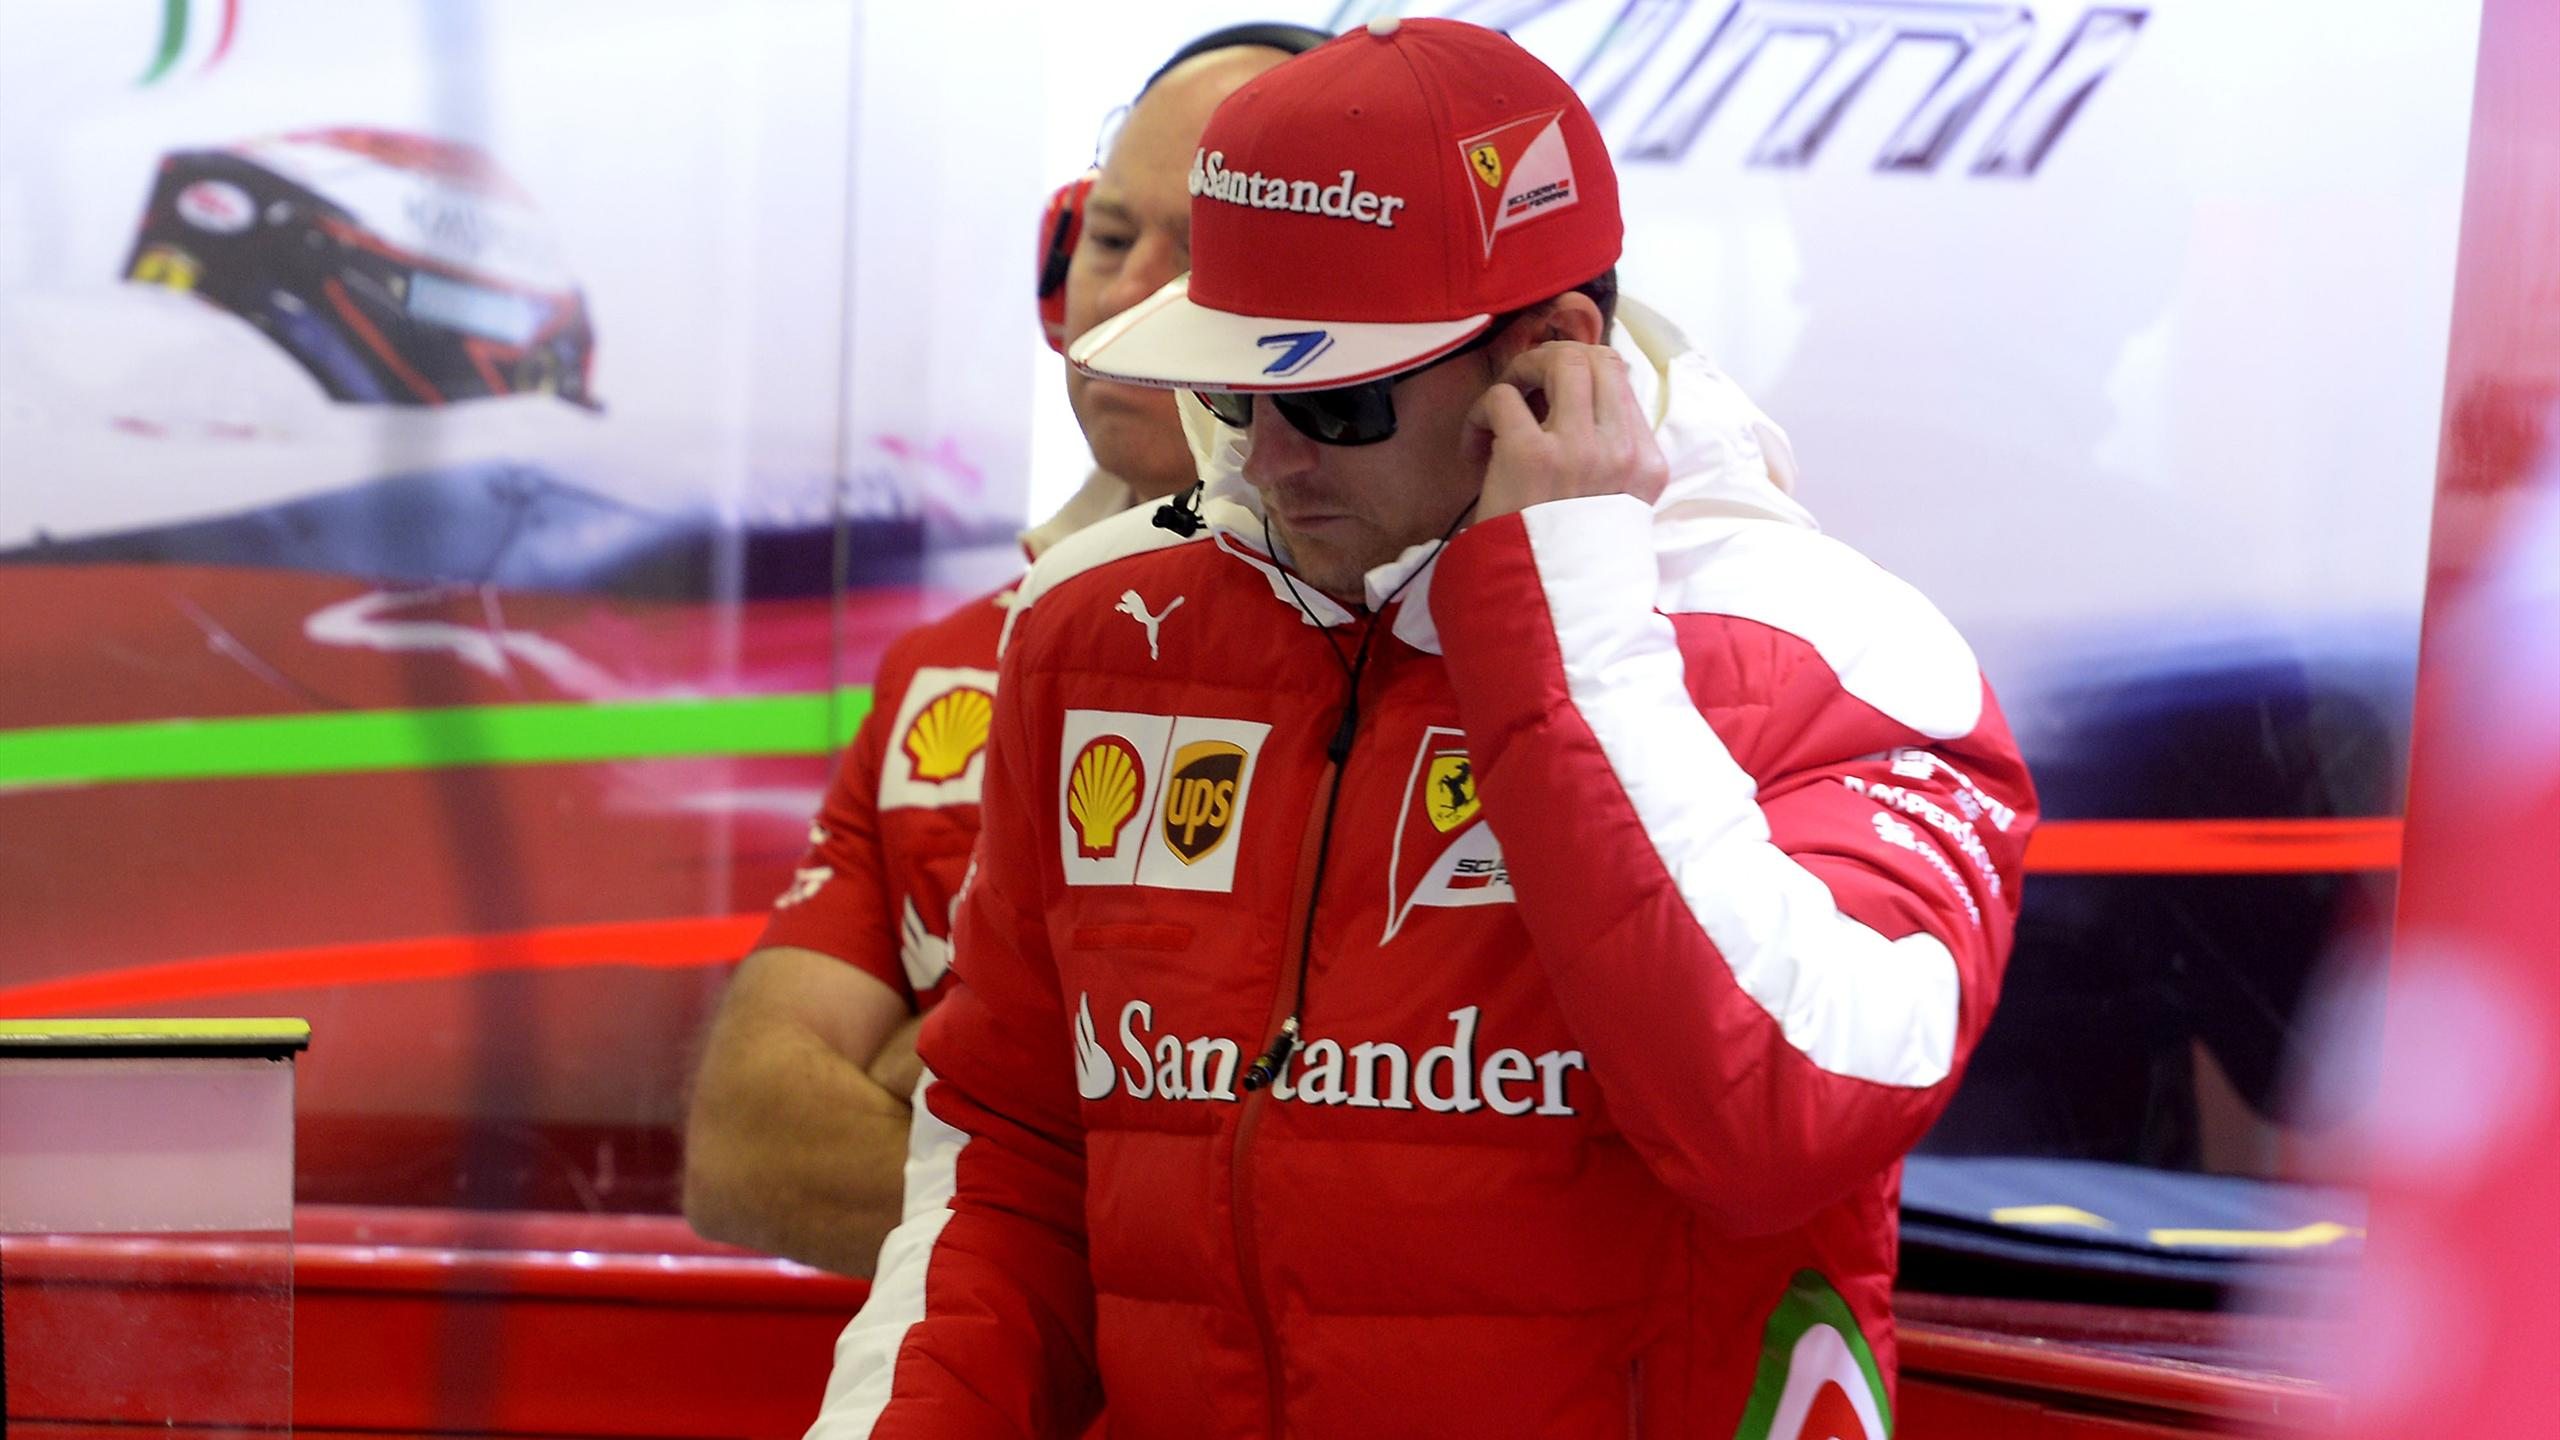 Kimi Räikkönen (Ferrari) au Grand Prix du Mexique 2016